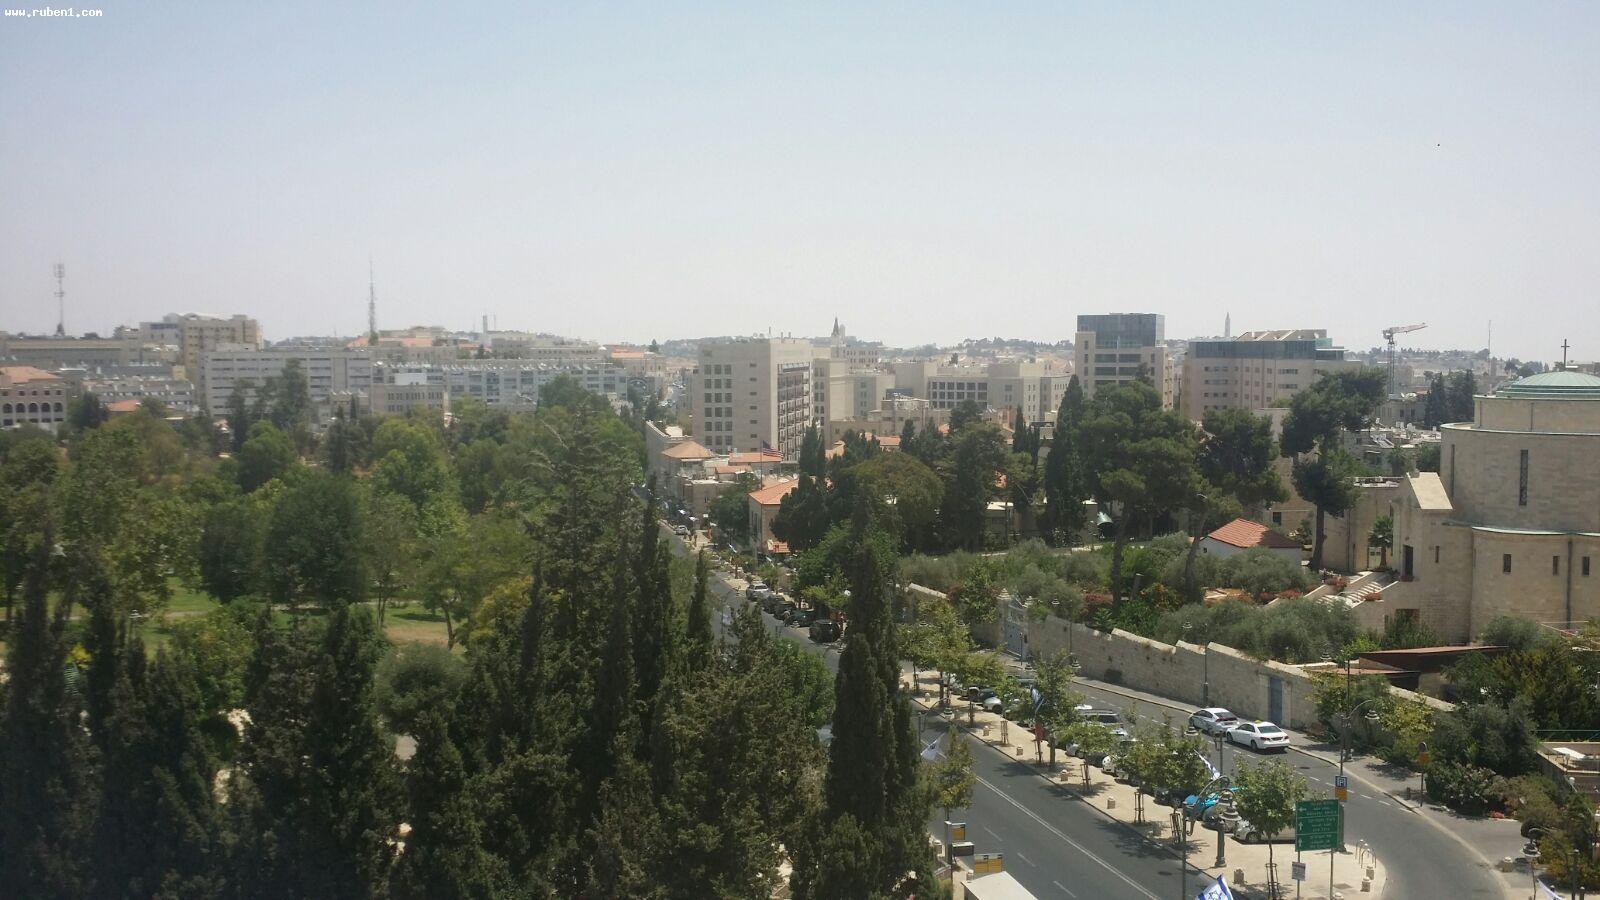 Real Estate Israel - Jerusalem City Center דירה ברחוב קינג ג'ורג', מרווחת כ-85 מ''ר, מרפסת גדולה מסביב... Rubens Real Estate